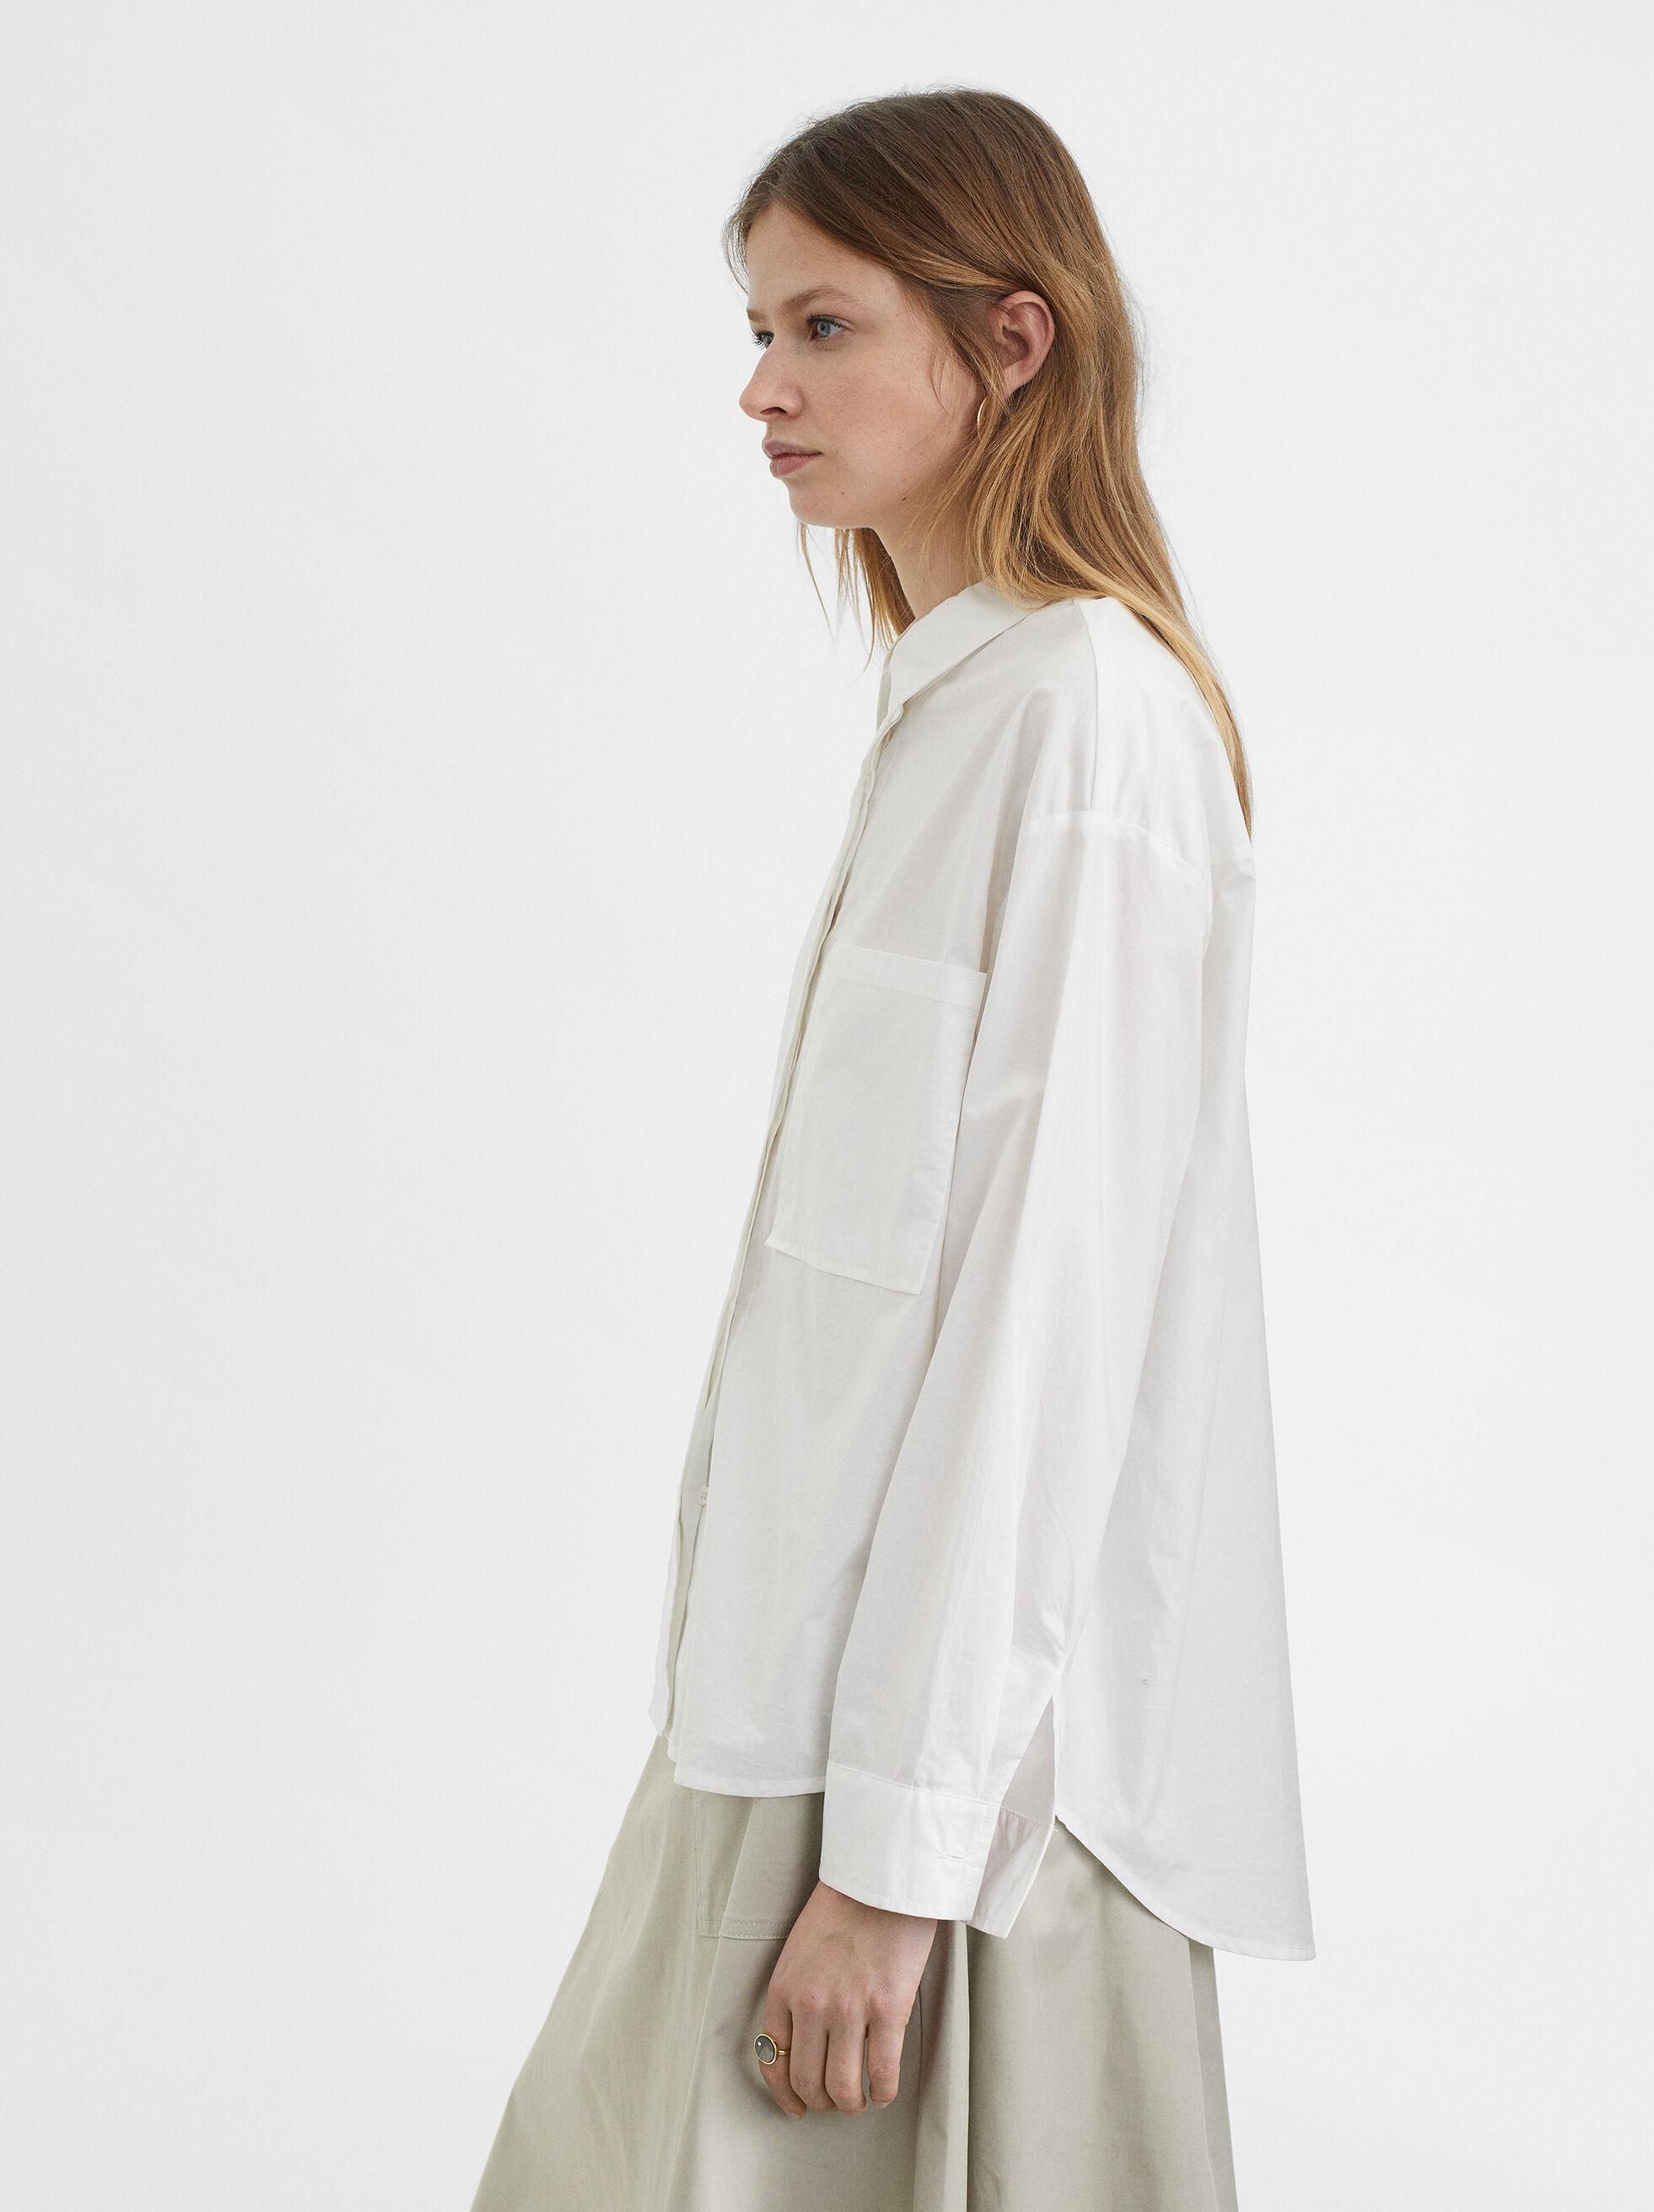 Shirt With Pocket, White, hi-res